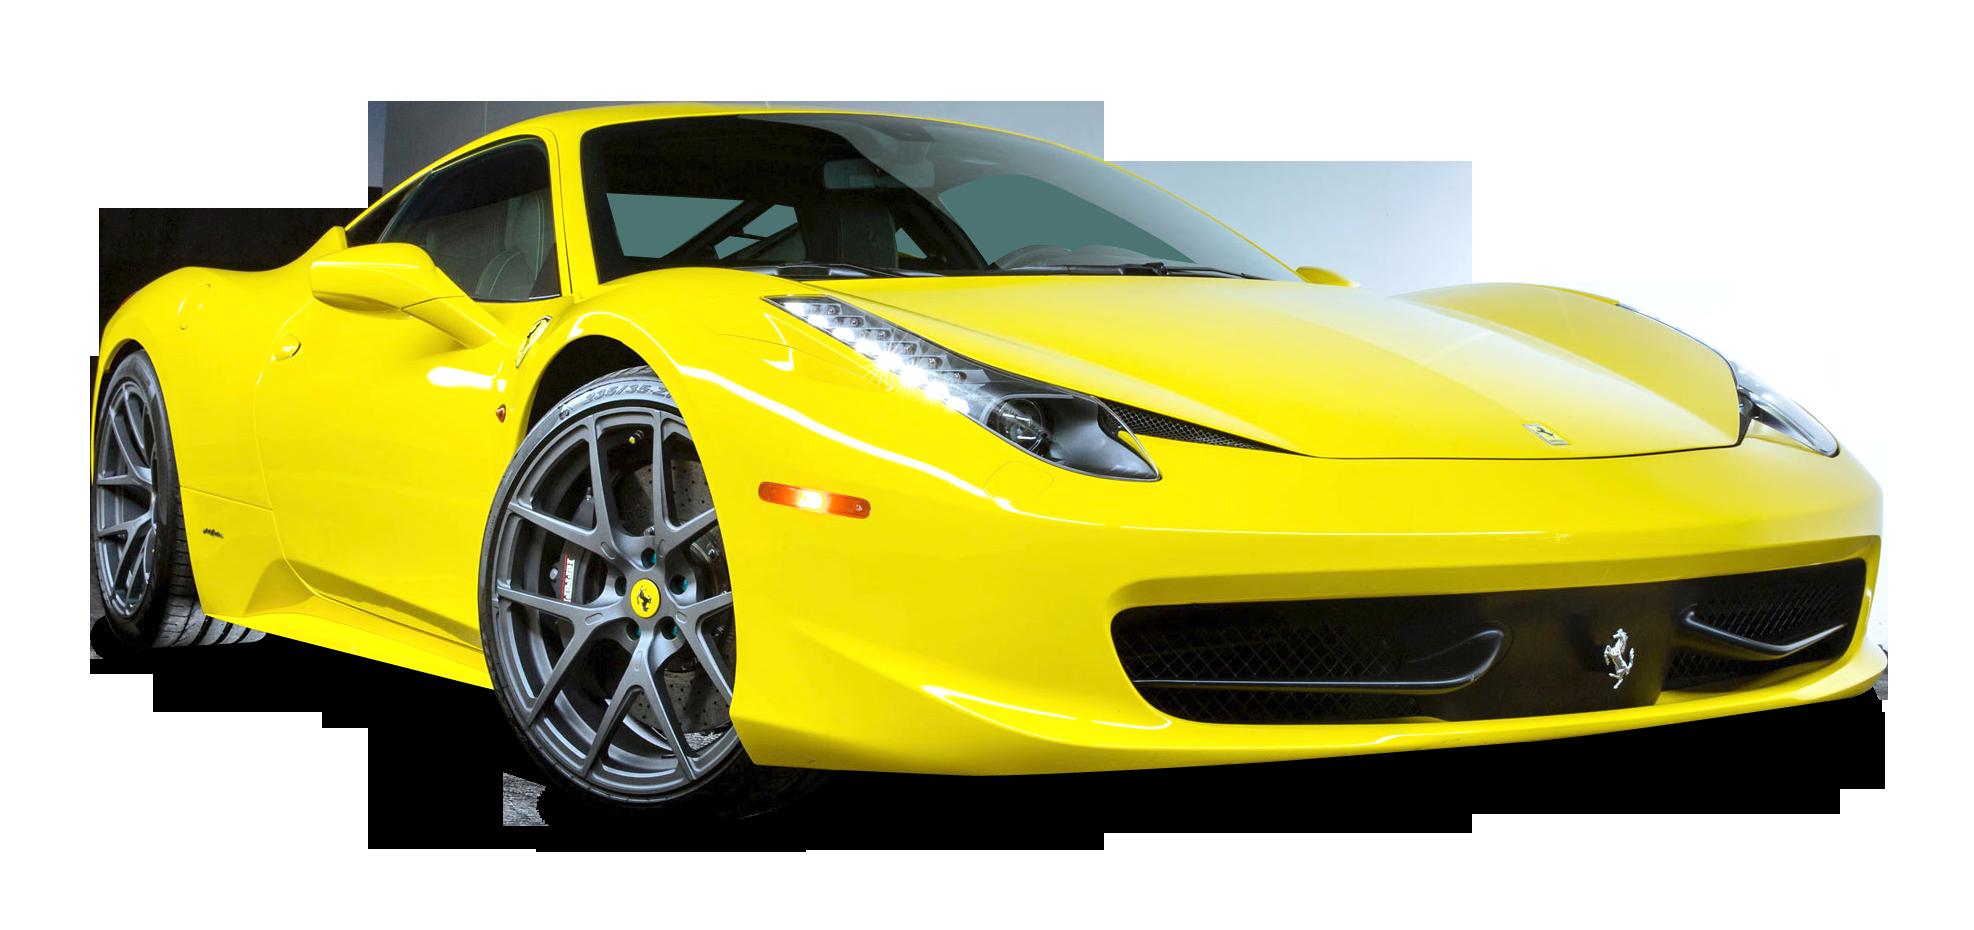 Ferrari 458 Italia Car PNG Image.